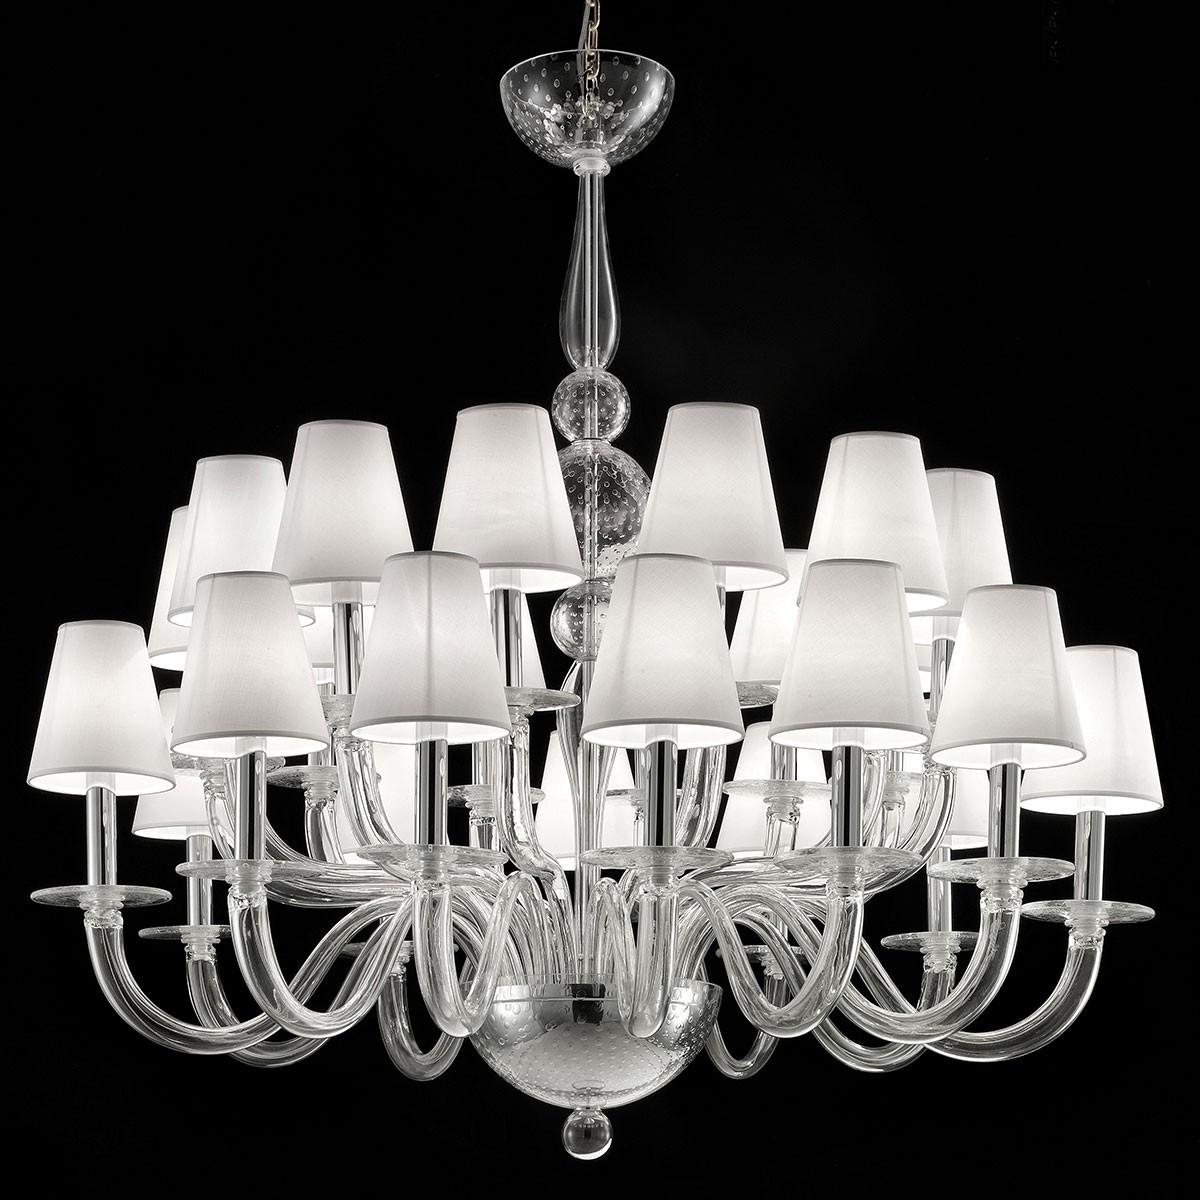 """Vasco"" lampara de araña de Murano - 12 + 12 luces, transparente"